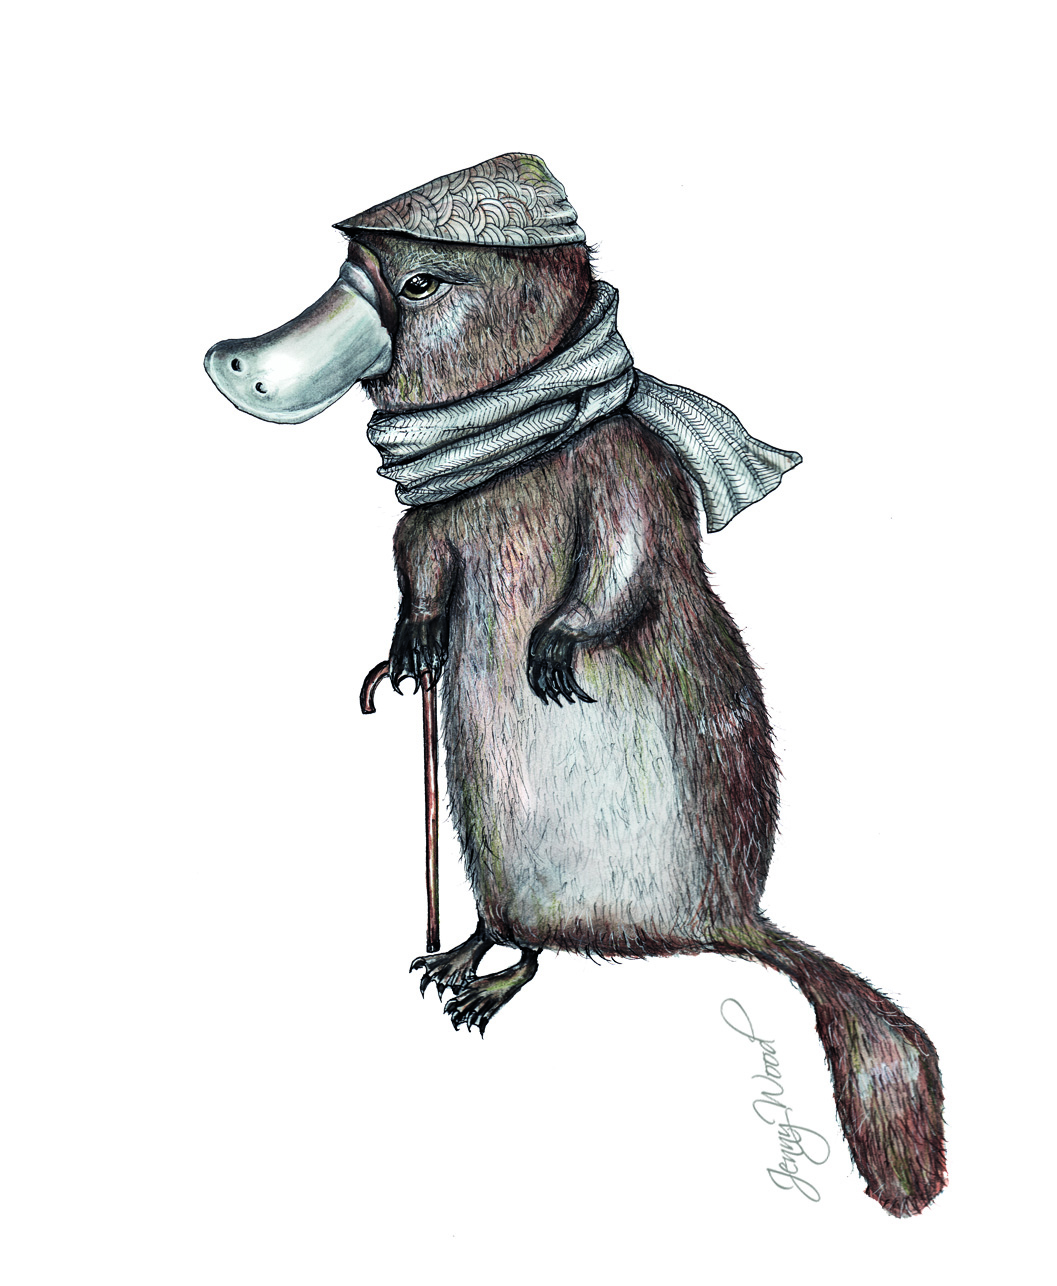 Mr platypus